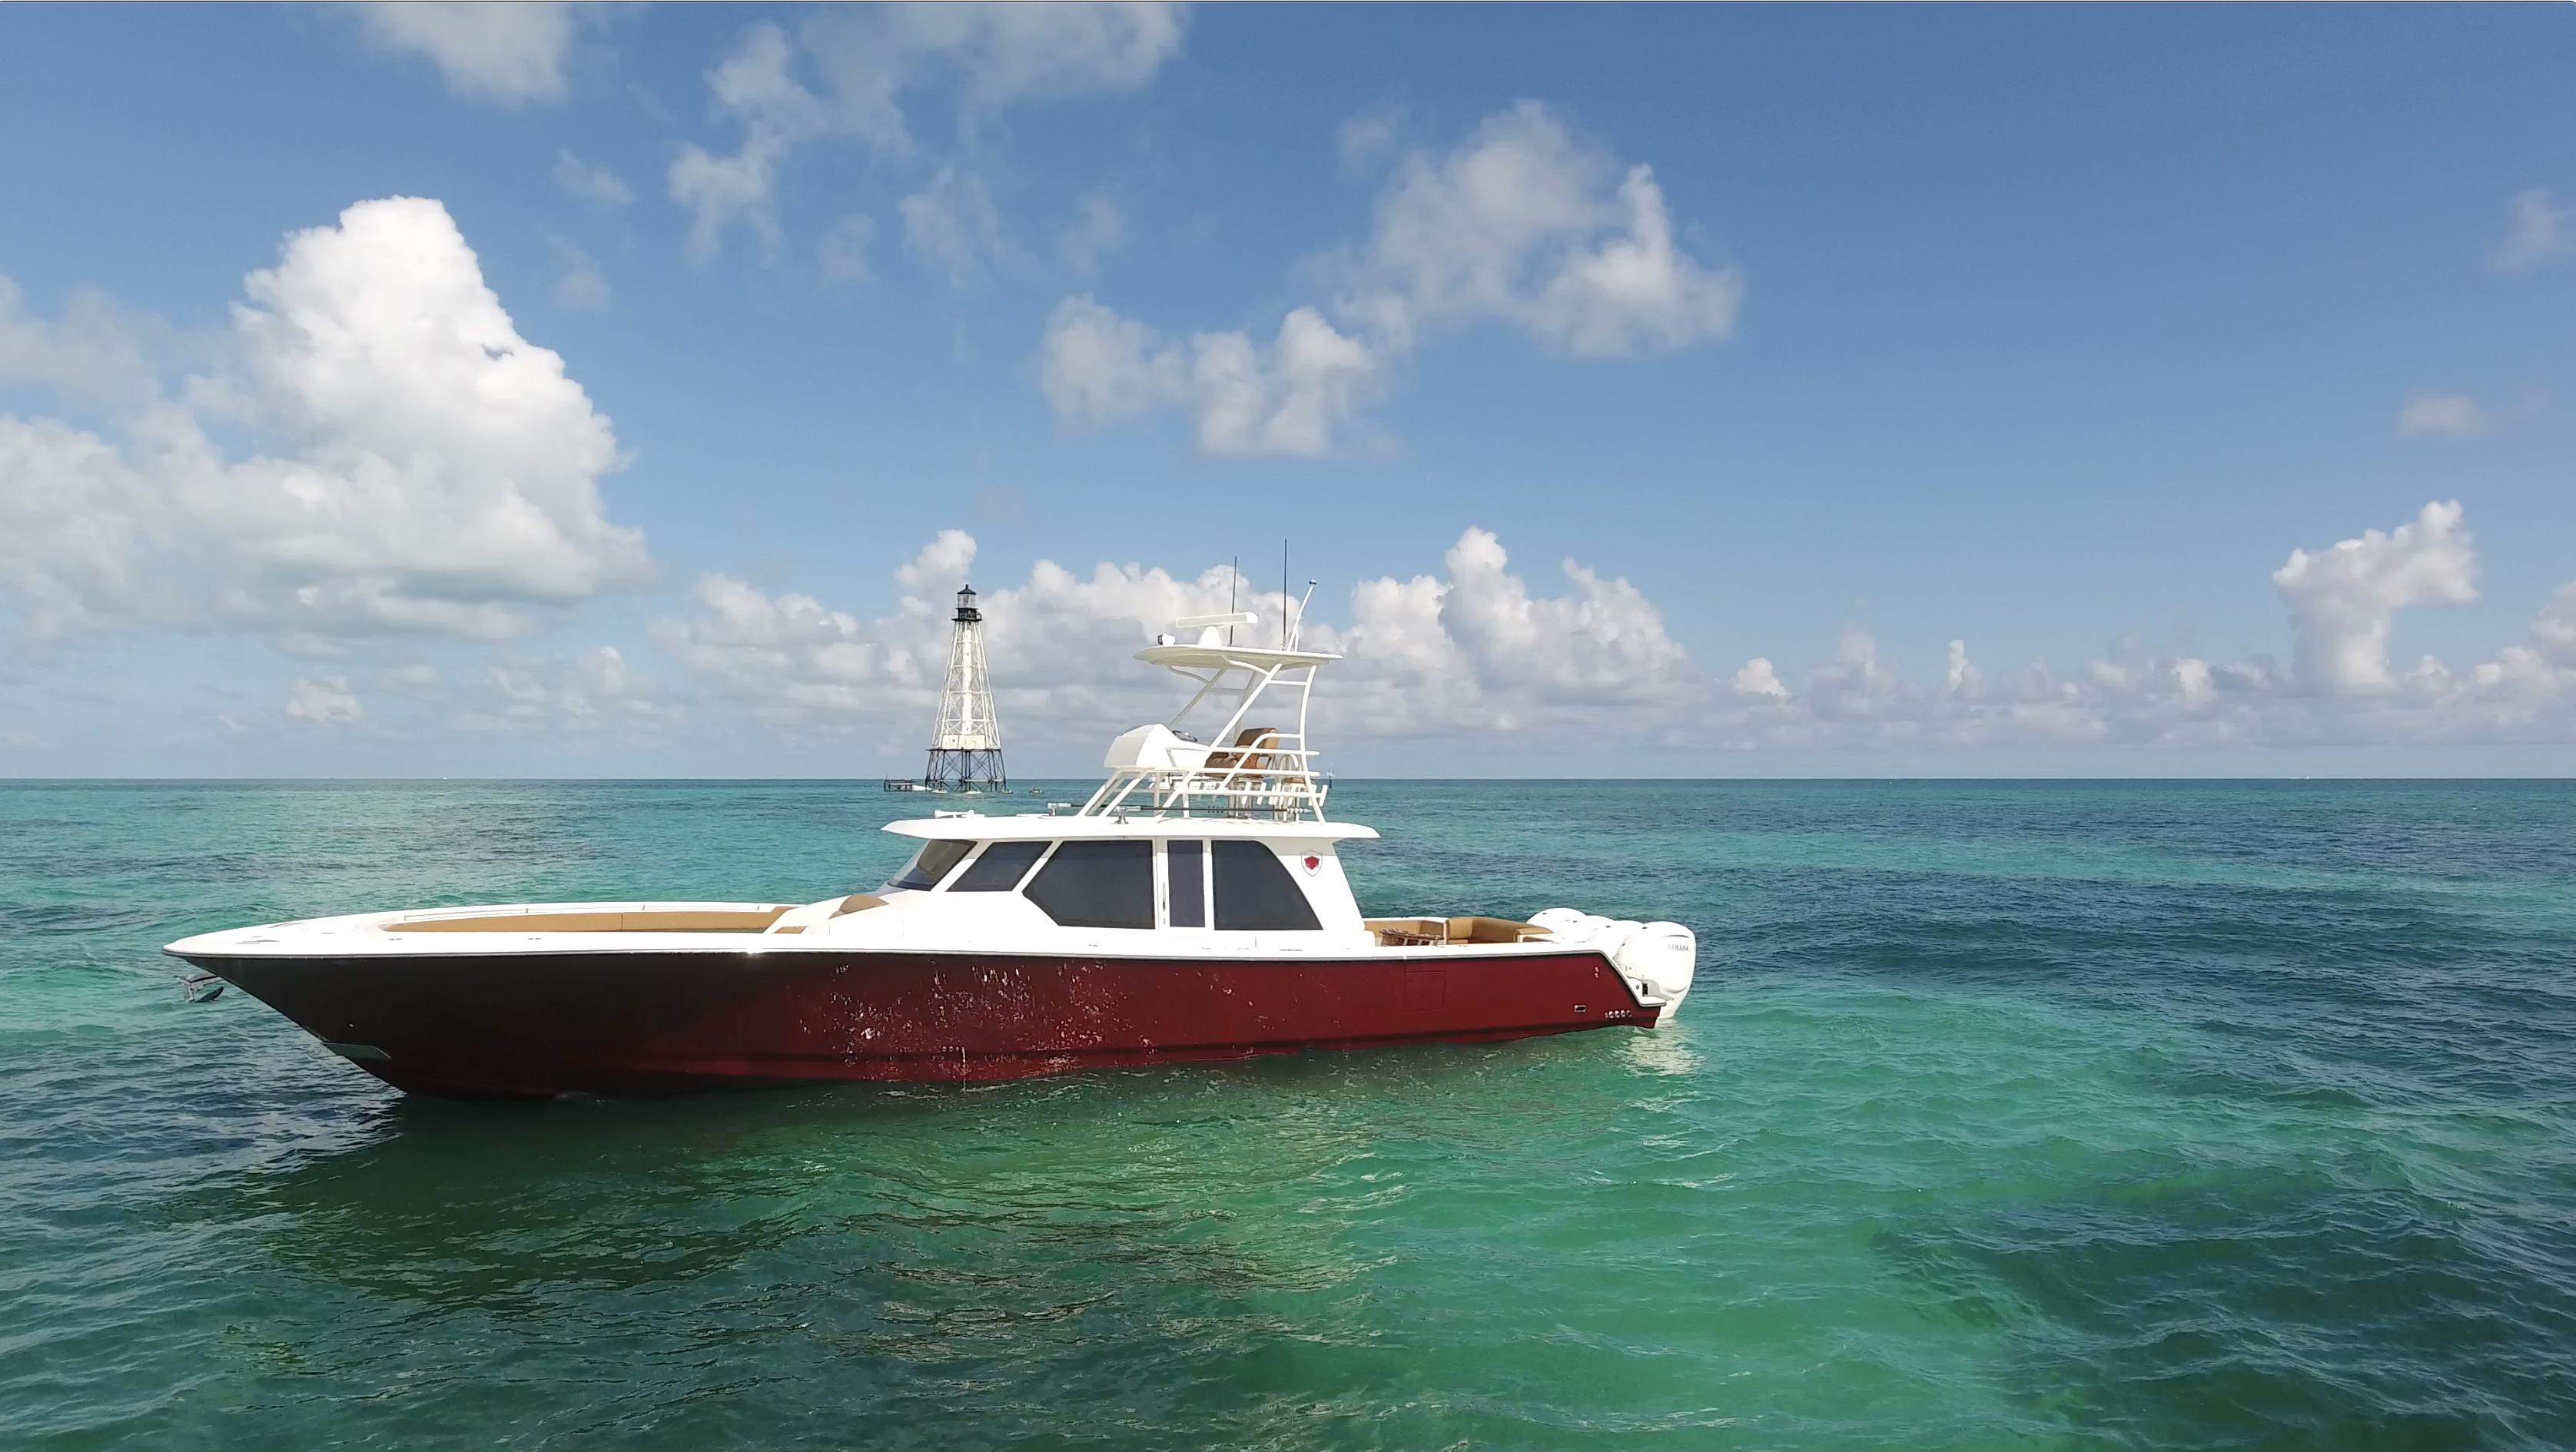 gulfstream yachts 52 metallic red in key